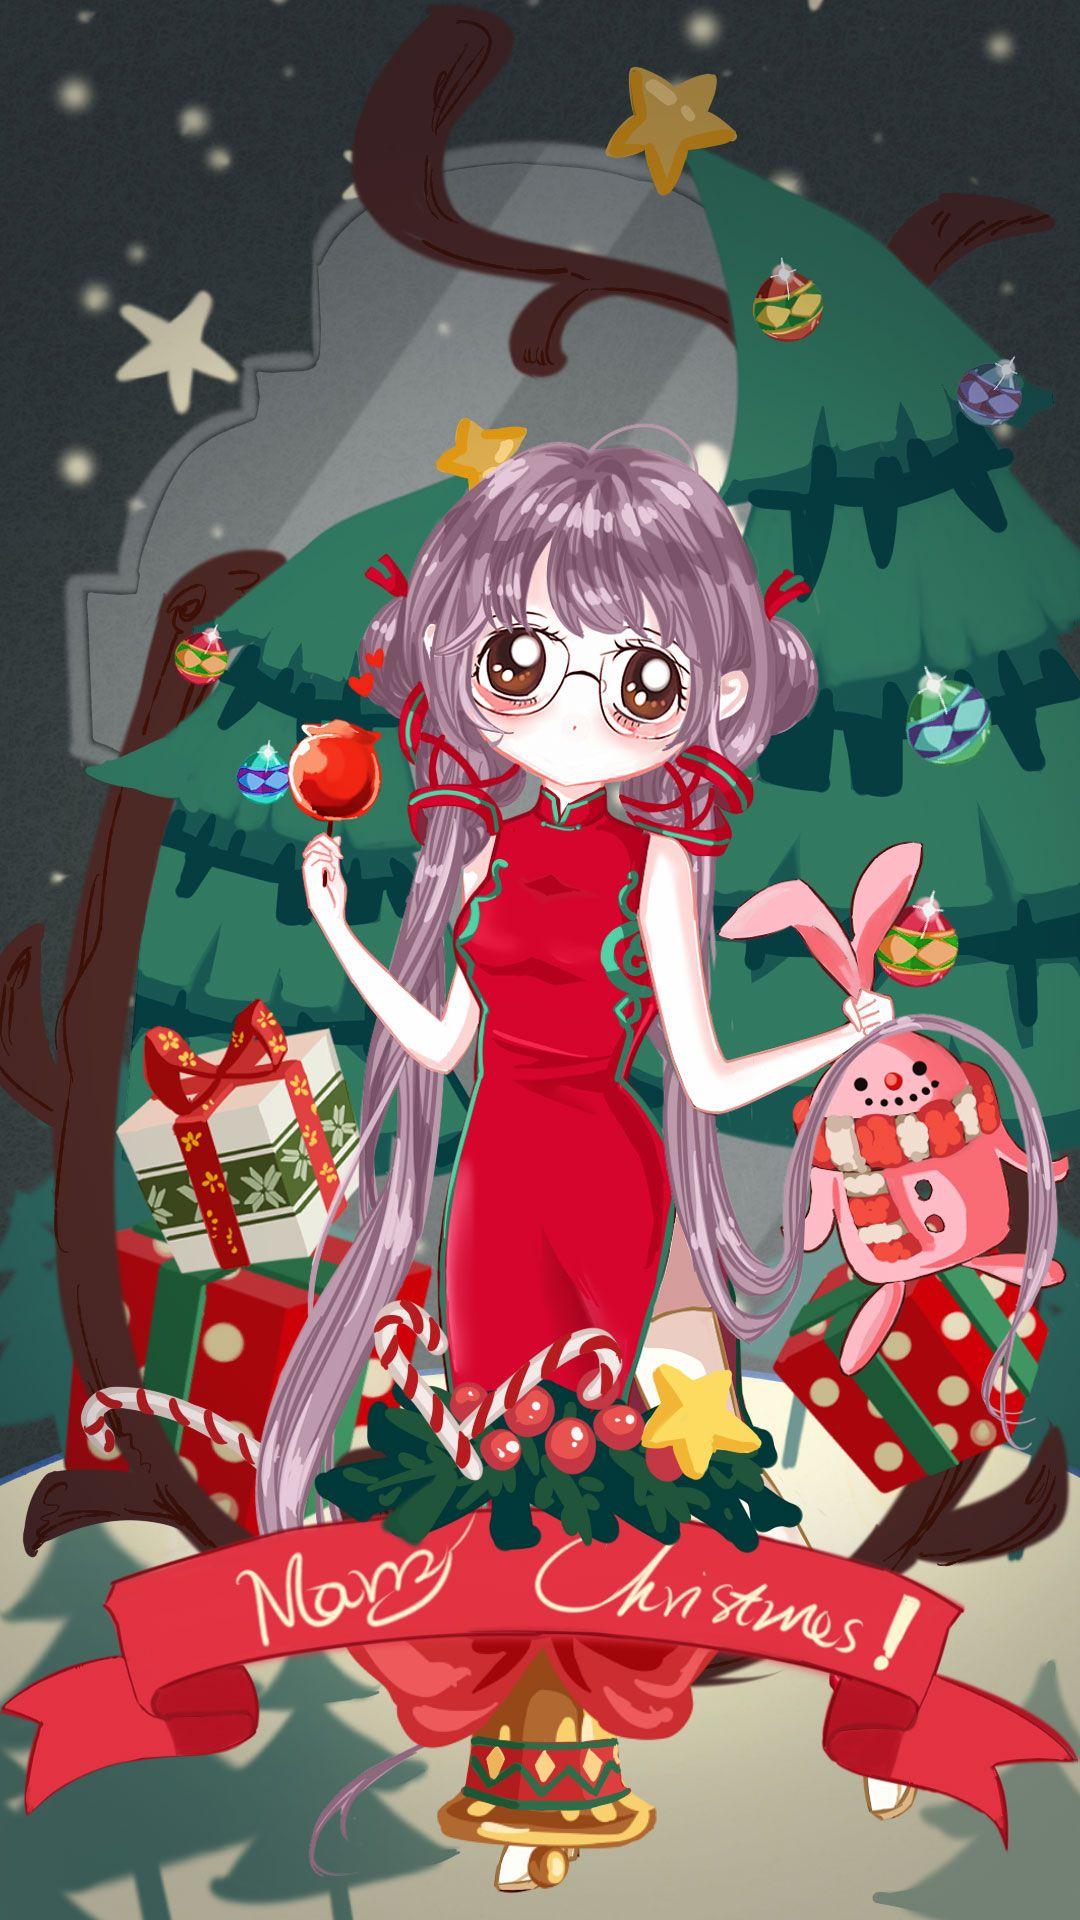 Merry Christmas Anime.Merry Christmas Anime Christmas In 2019 Anime Chibi